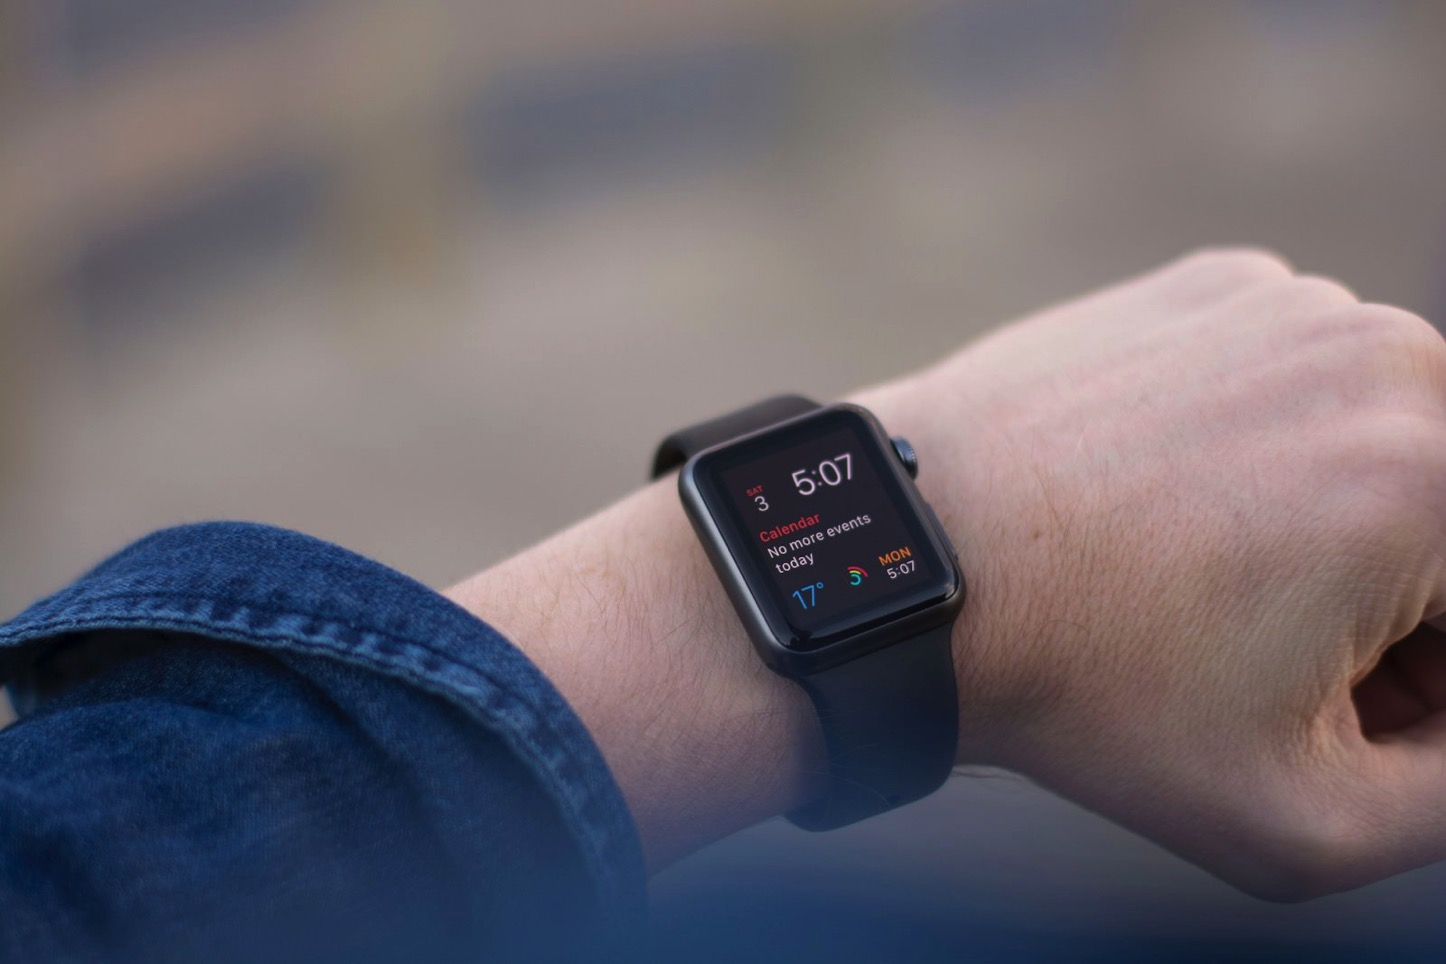 gian-prosdocimo-307419-Apple-Watch-Unsplash.jpg